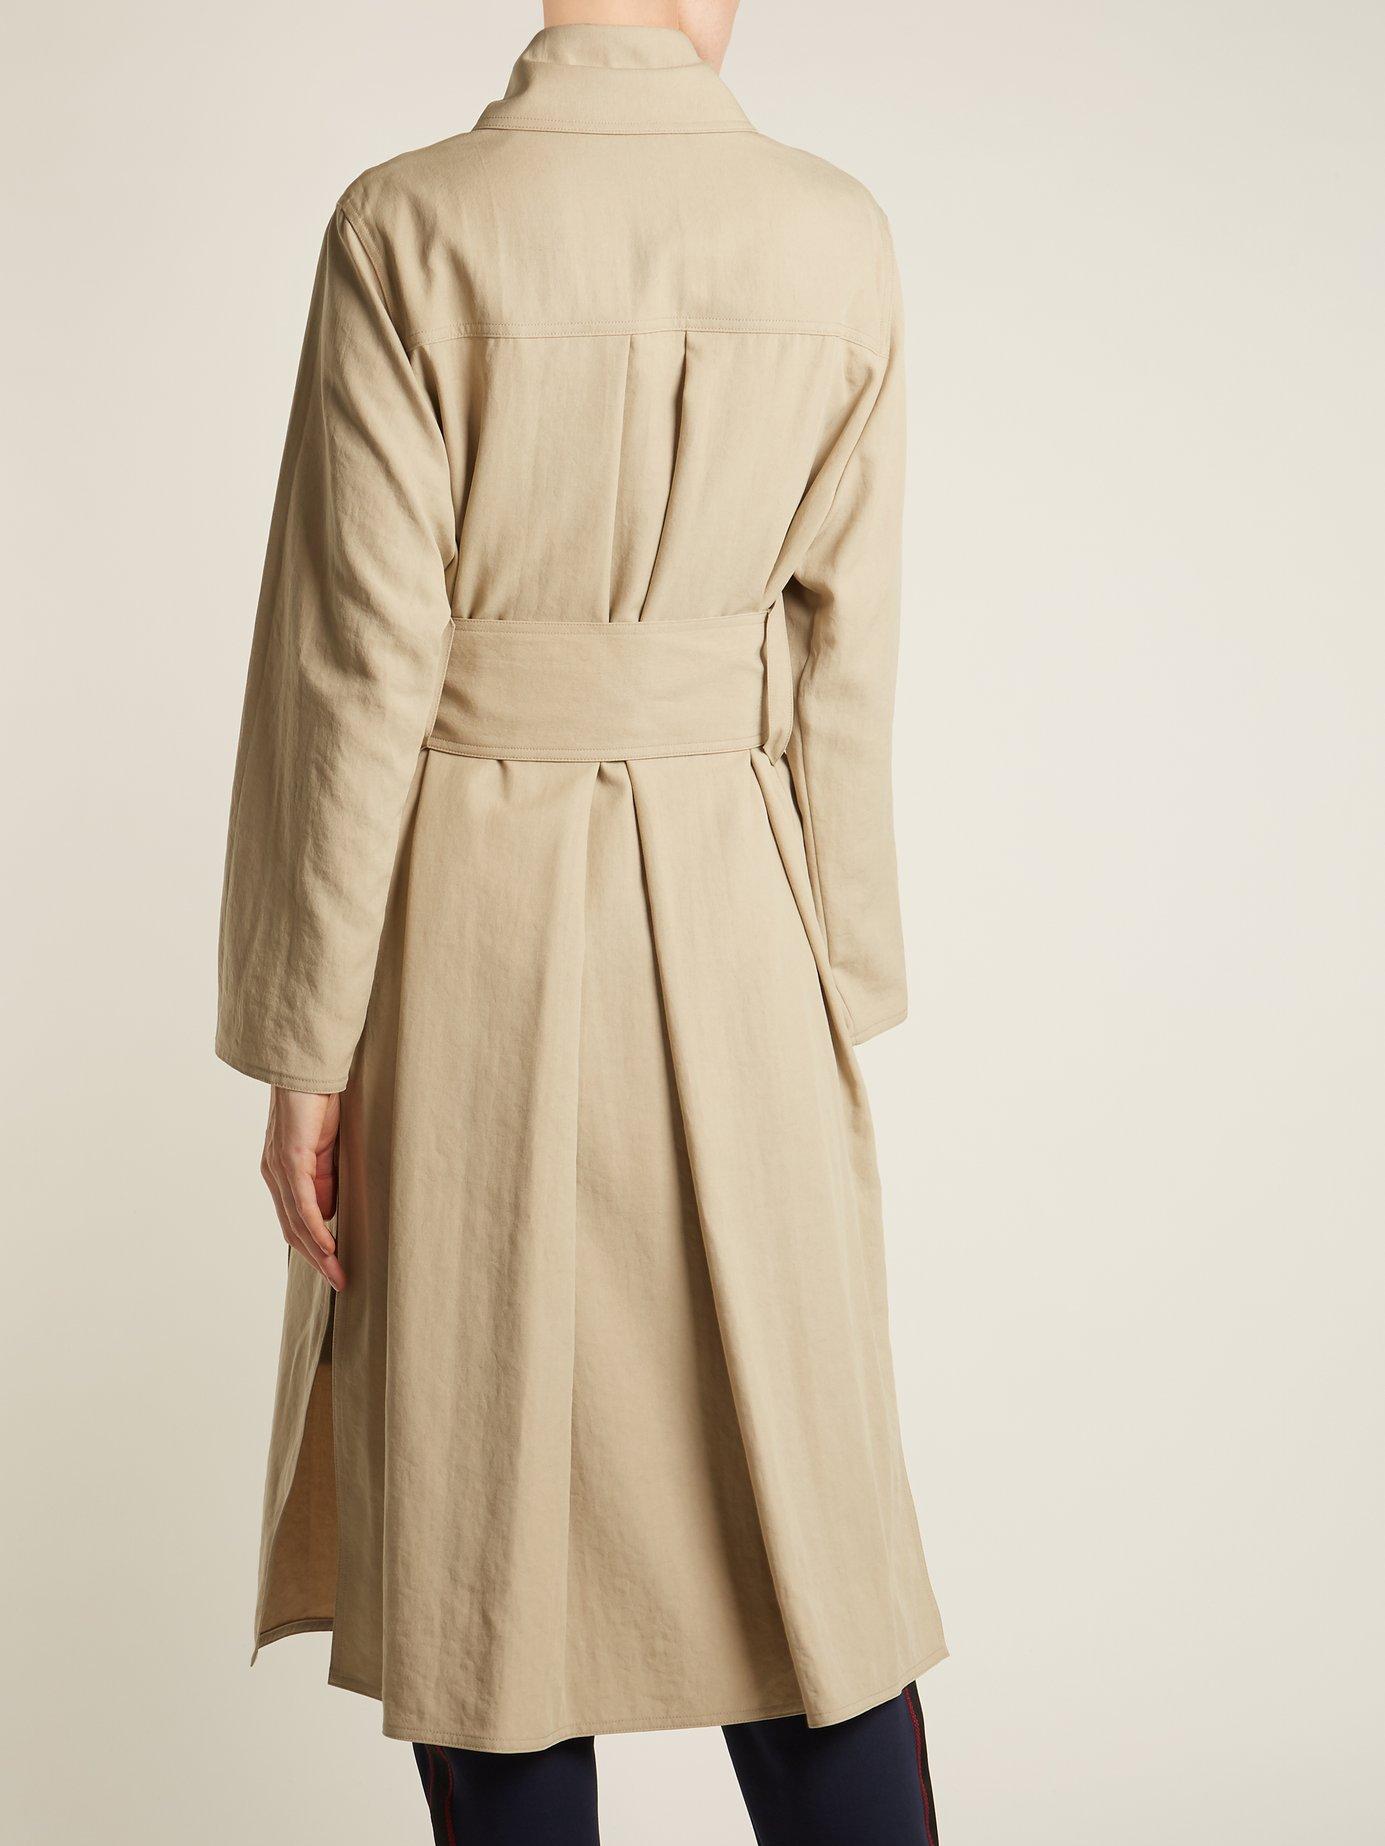 Creda lightweight trench coat by Acne Studios